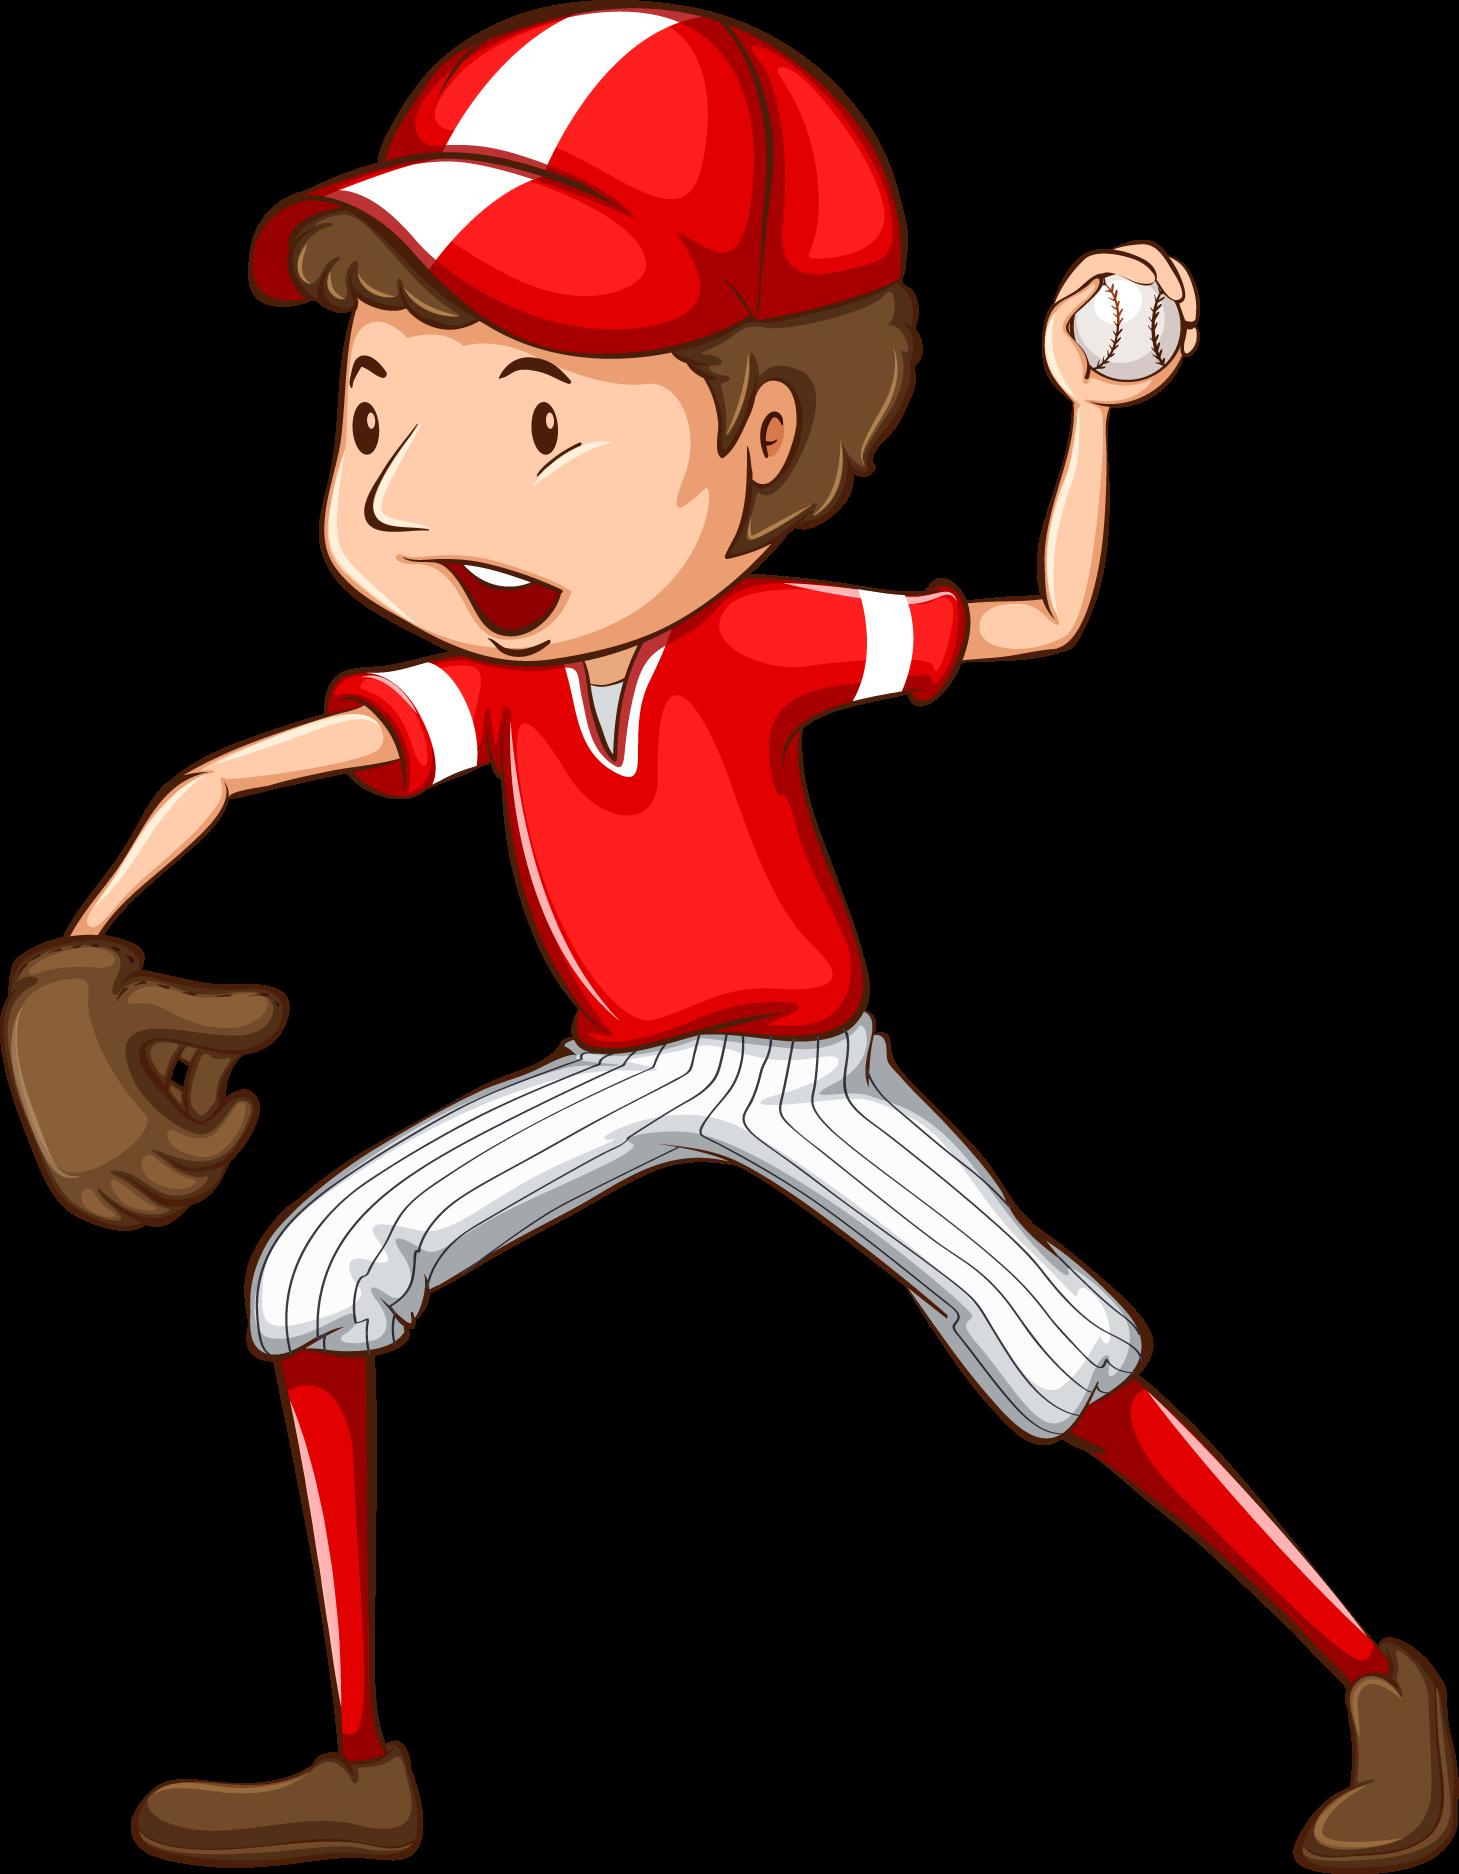 Pitcher equipo rojo